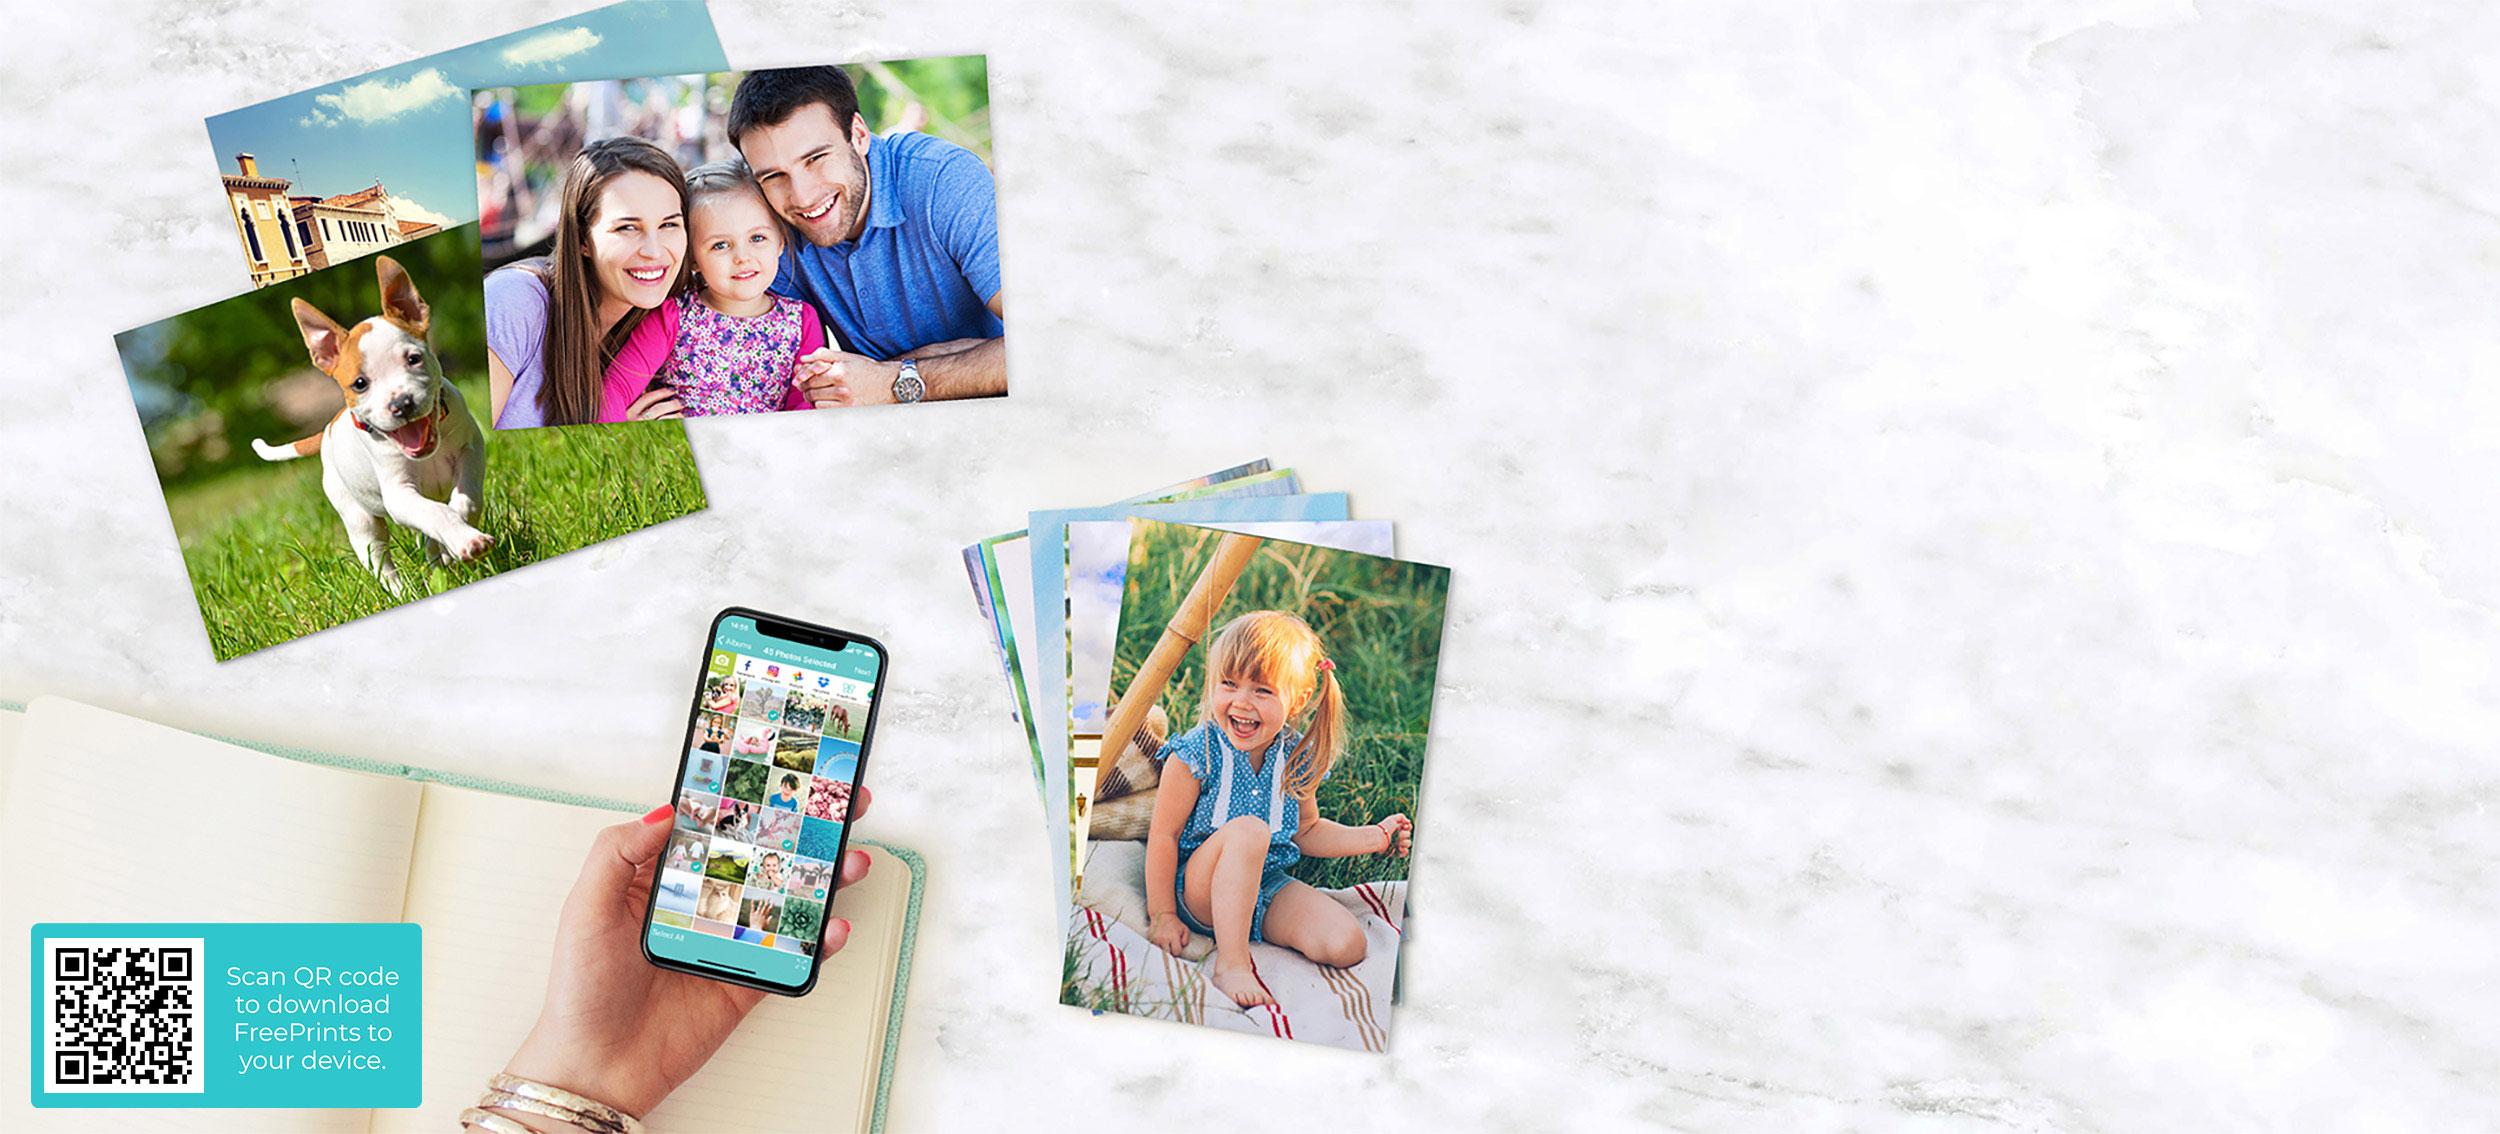 get free photo prints